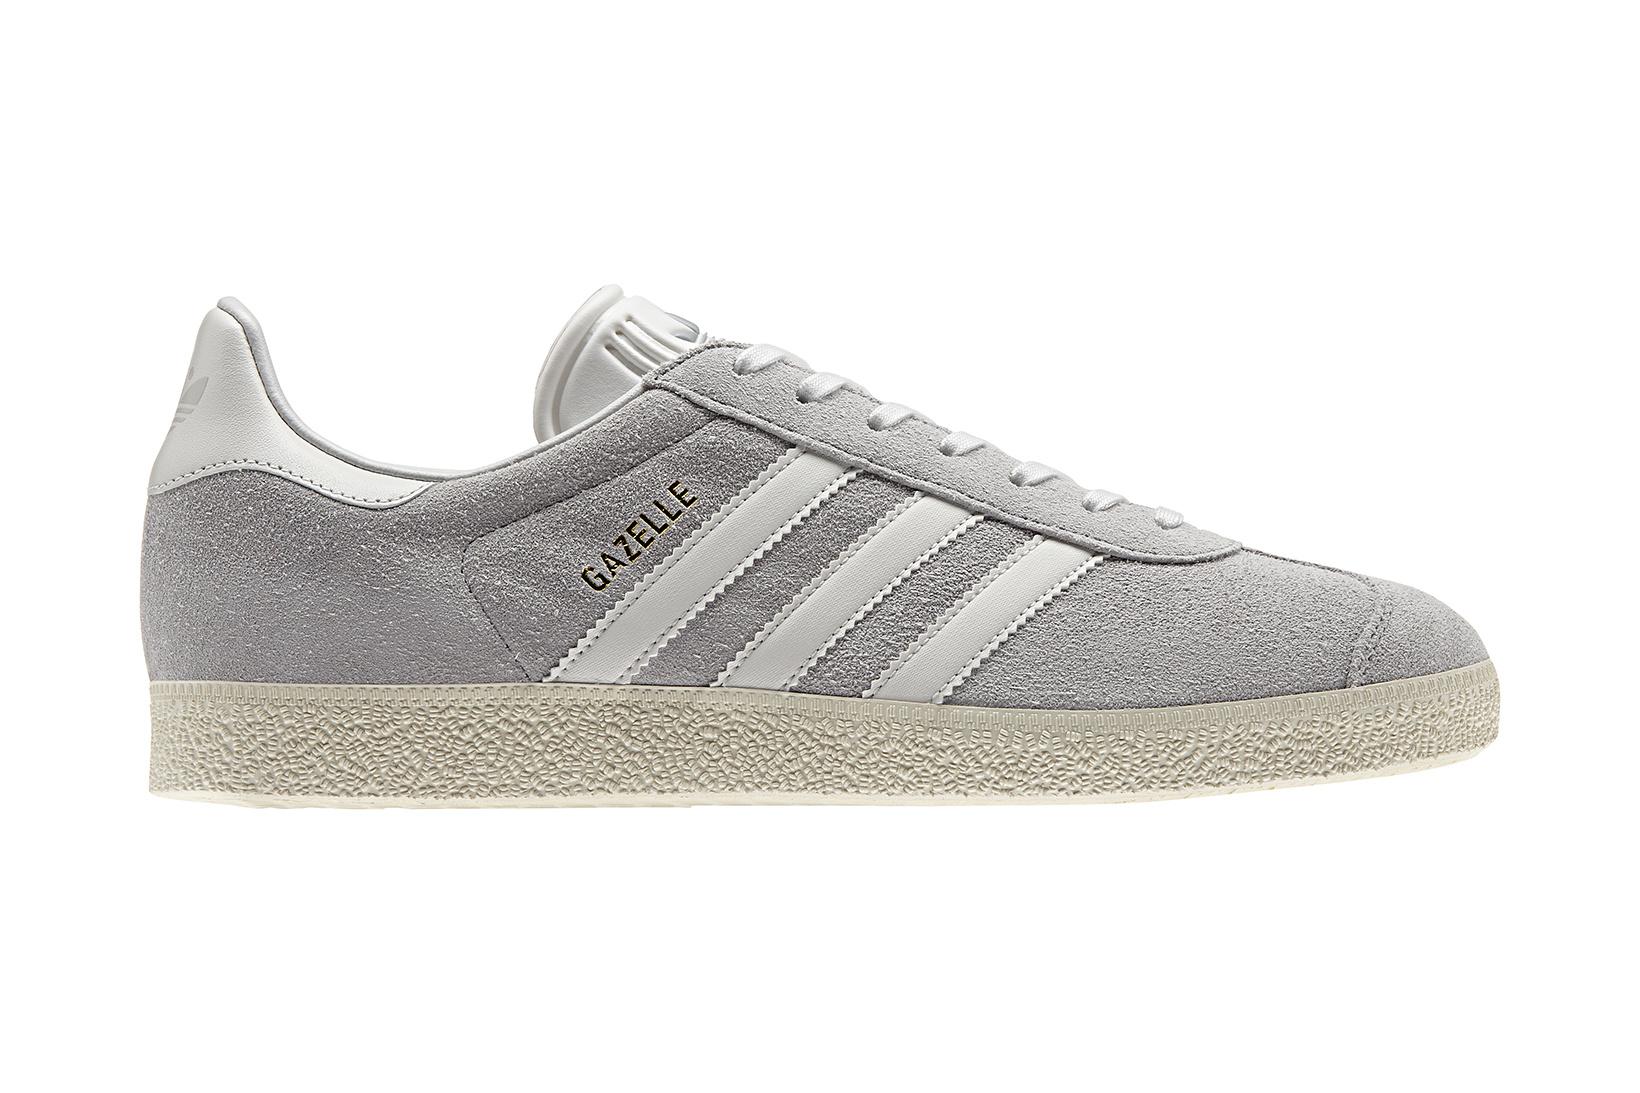 online store 9a308 b169f adidas Originals Gazelle Vintage Suede Grey ...